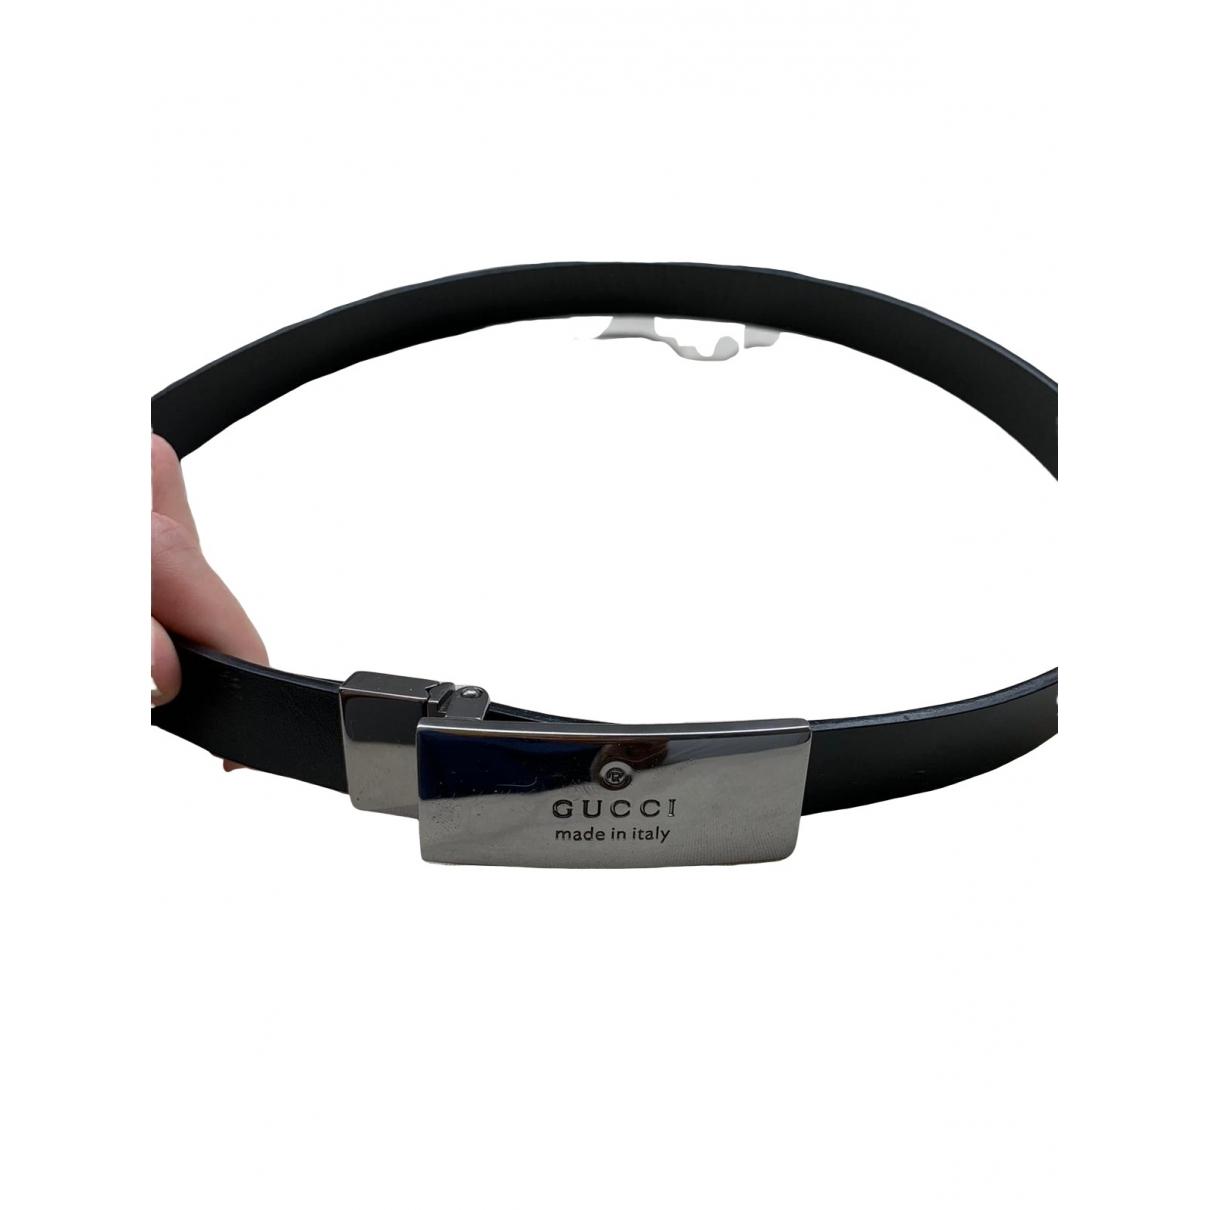 Gucci \N Black Leather belt for Women S International